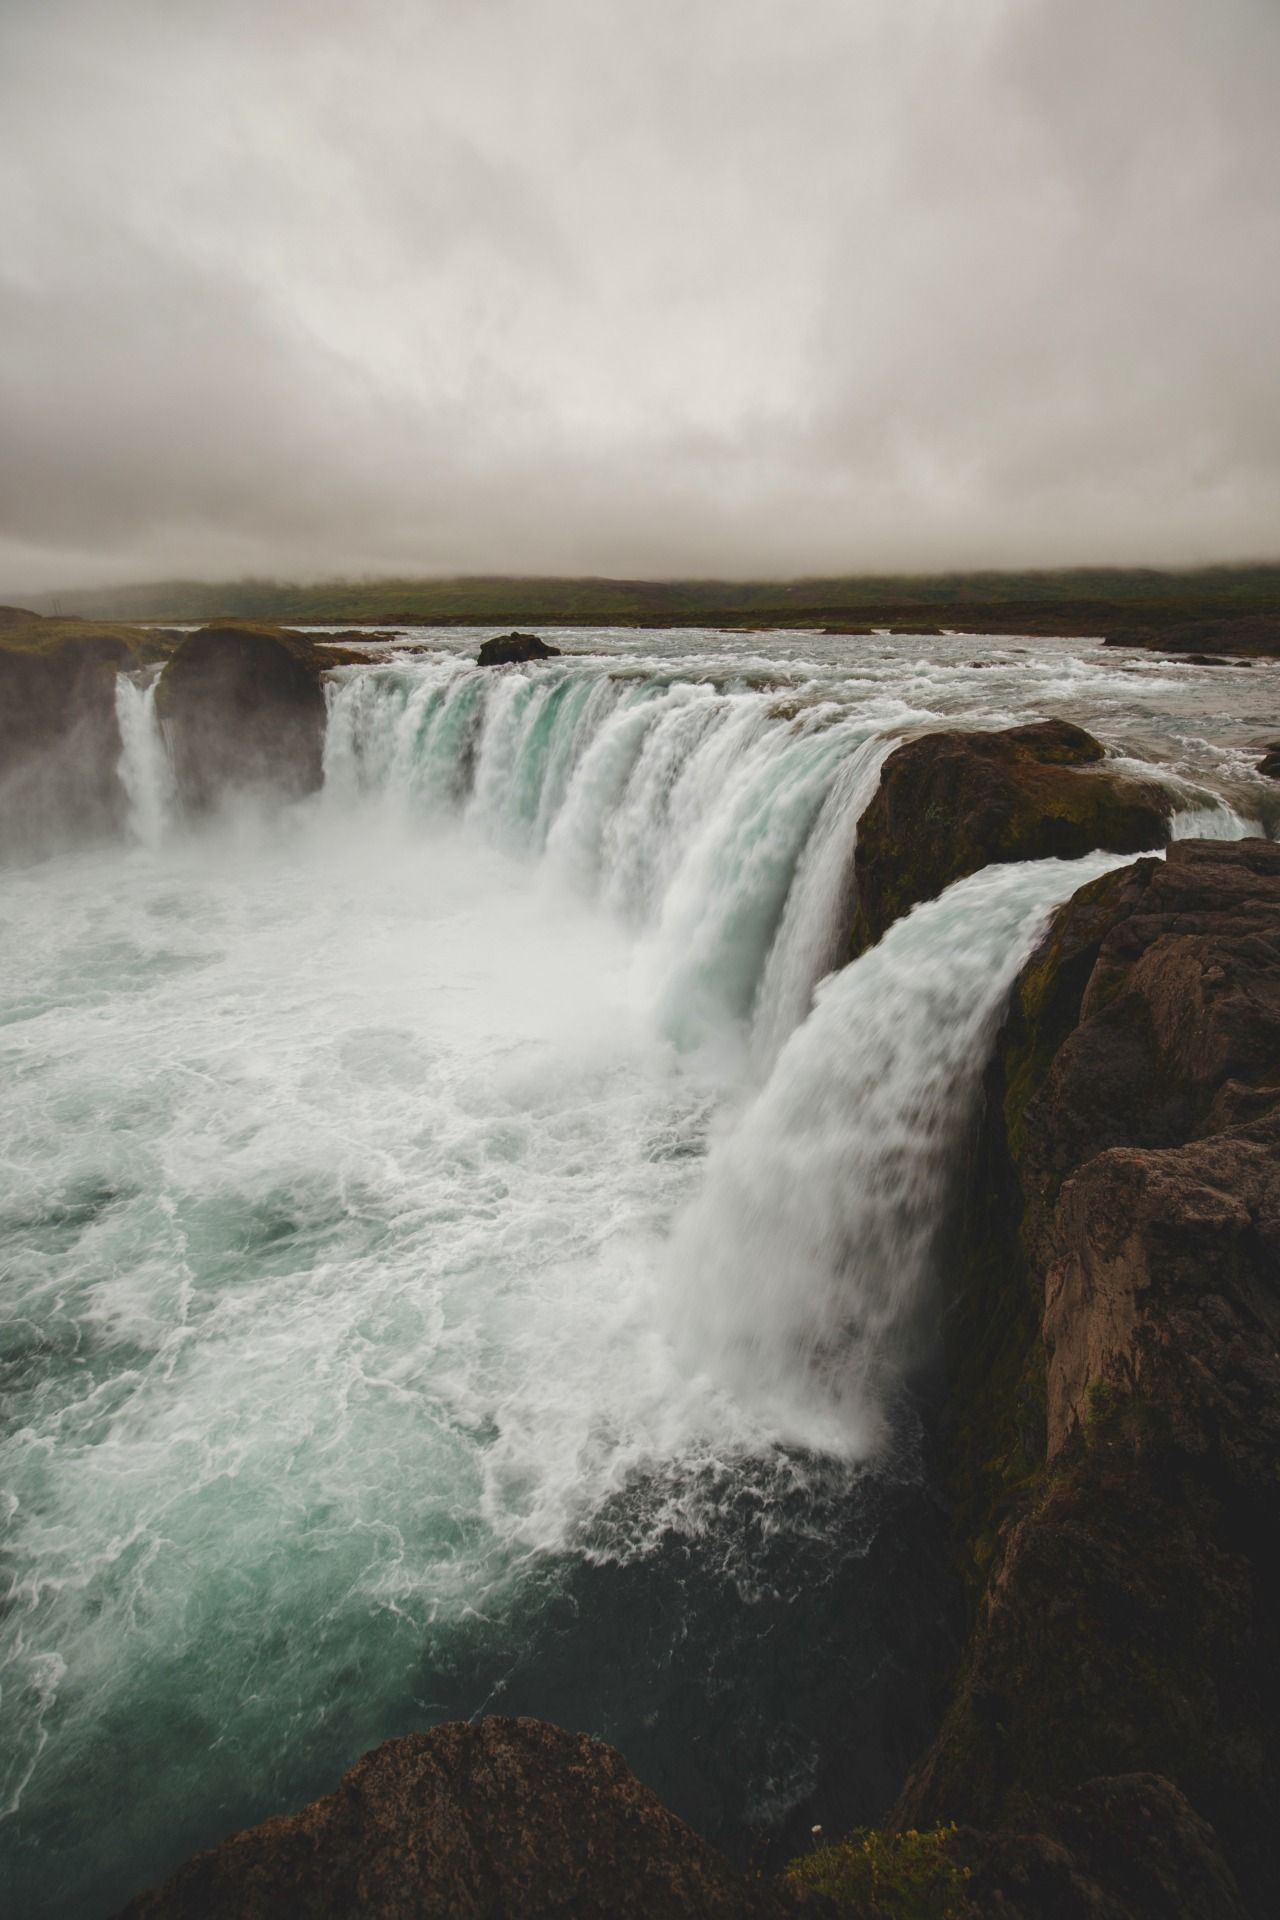 Consistent change - #(source) #godafoss #iceland #landscape #meolog #on #photographers #tumblr #waterfall?